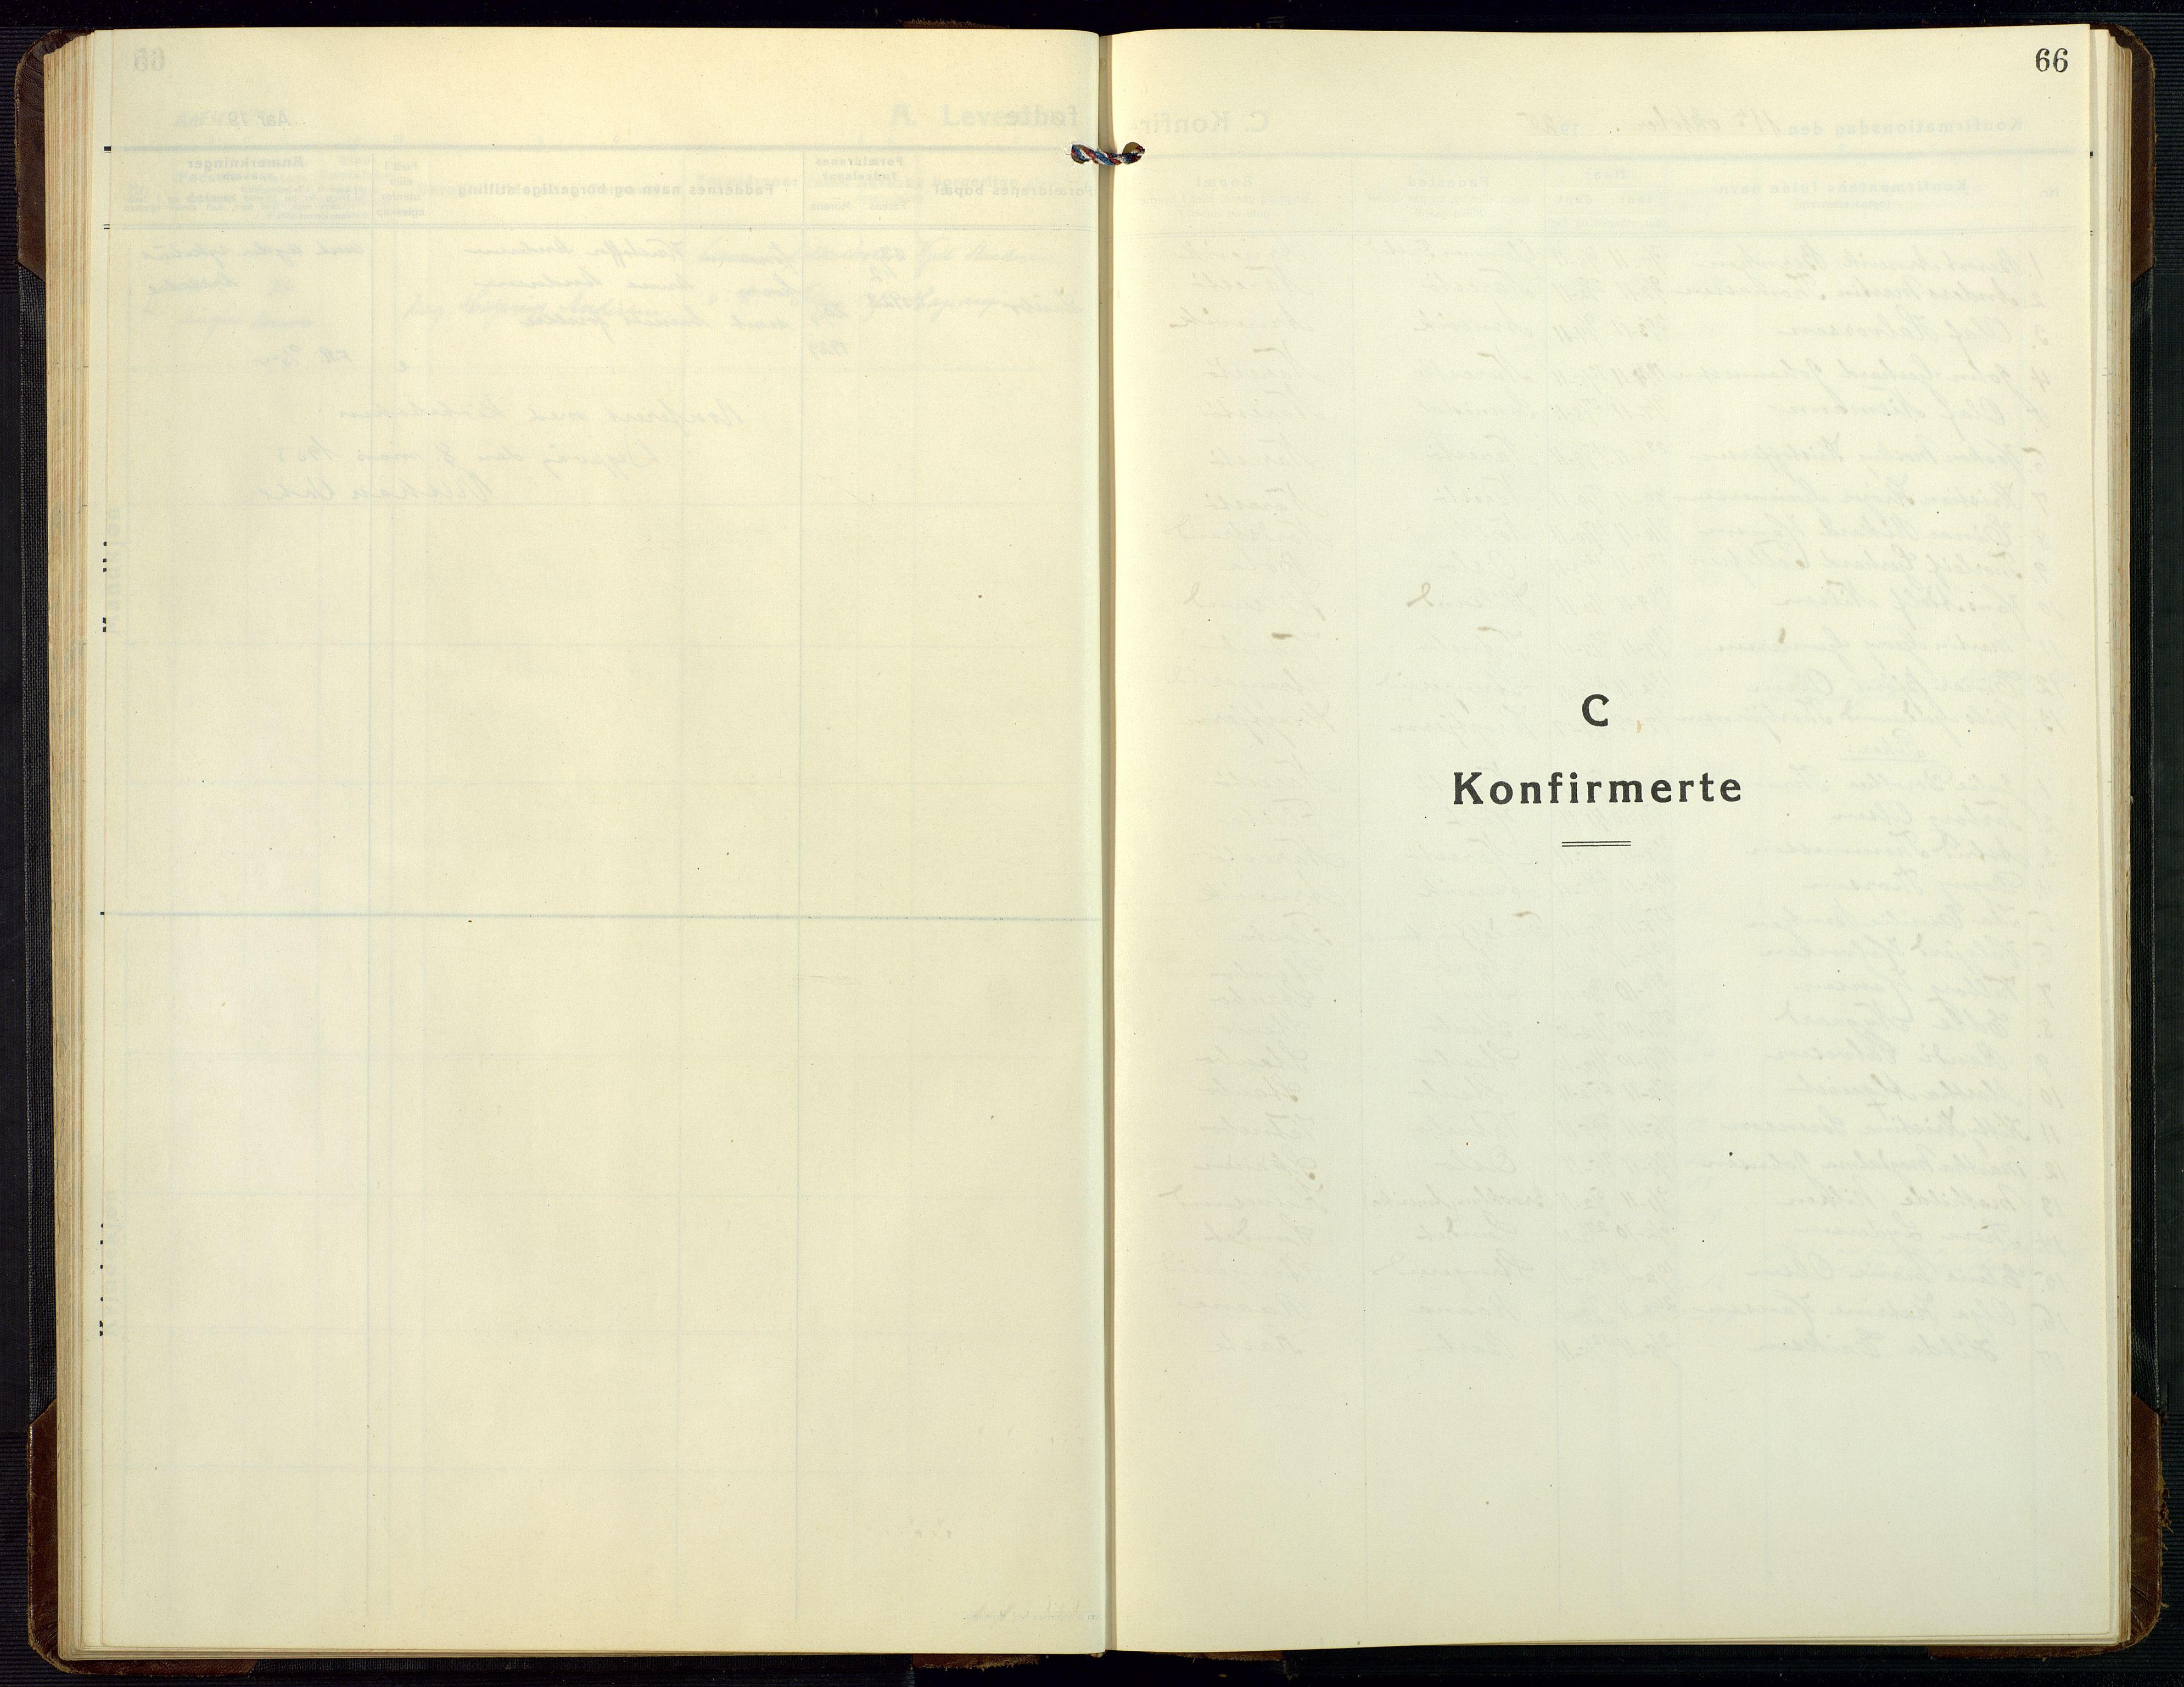 SAK, Dypvåg sokneprestkontor, F/Fb/Fbb/L0006: Klokkerbok nr. B 6, 1925-1954, s. 66